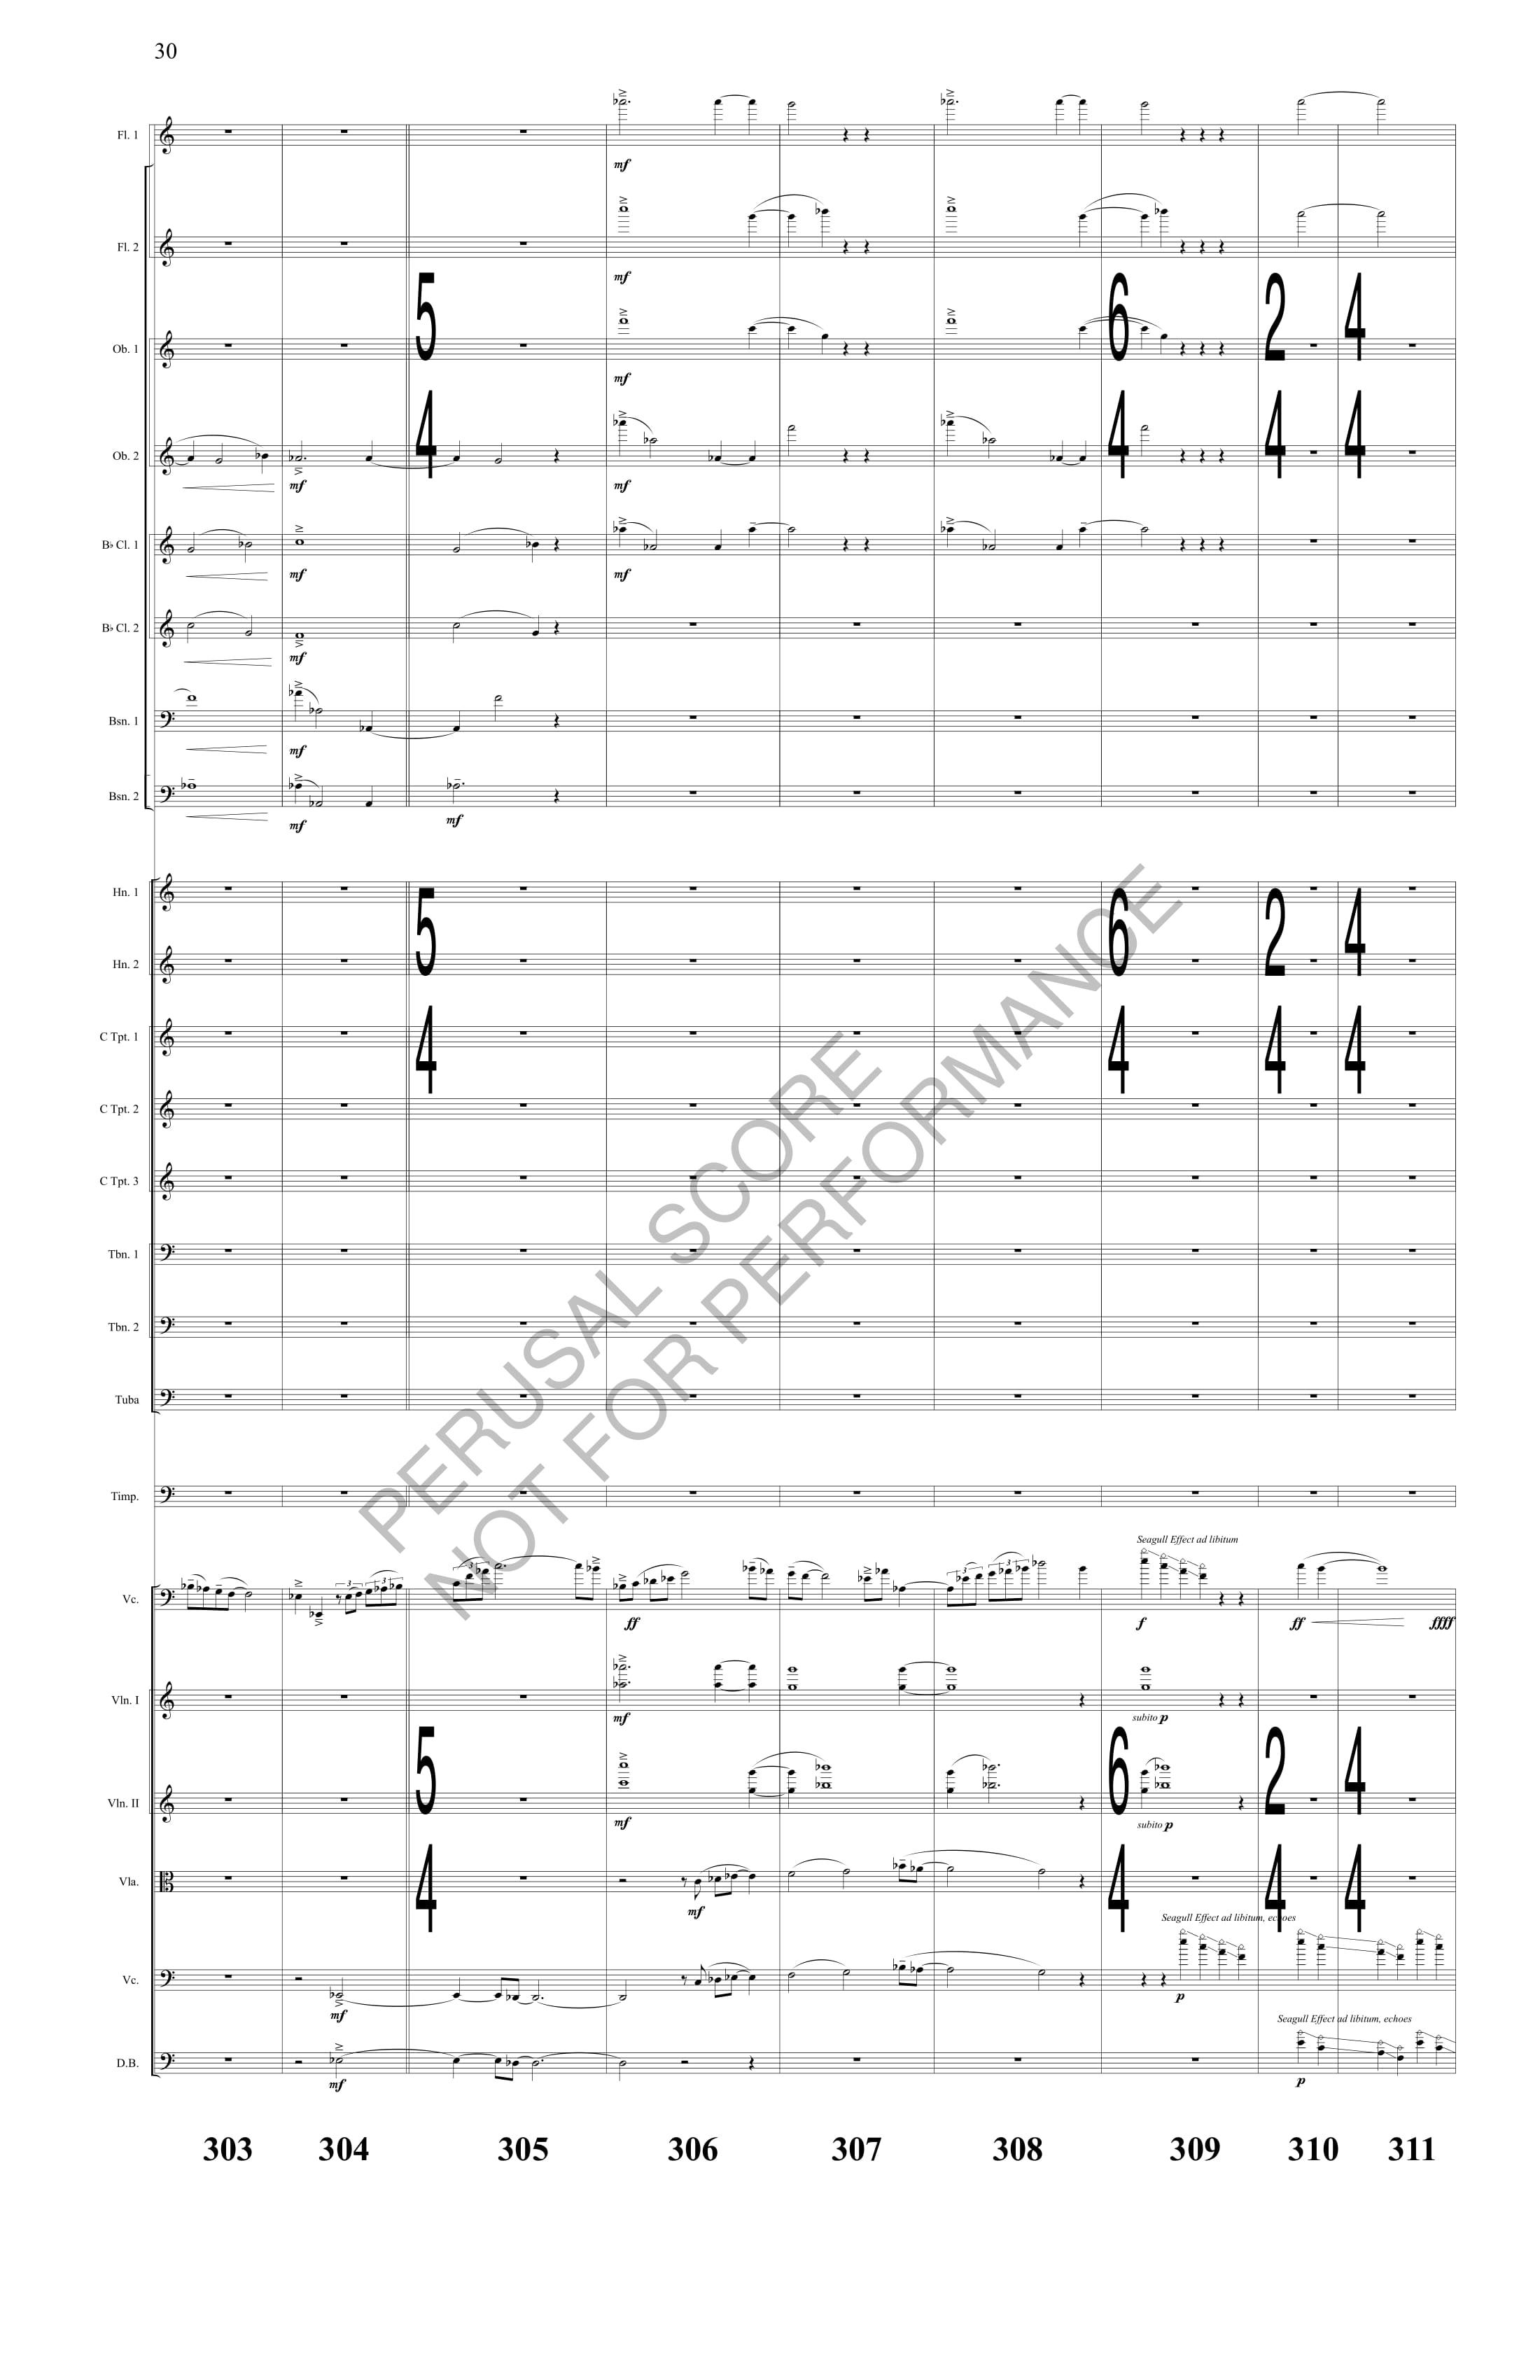 Boyd Tekton Score-watermark-36.jpg